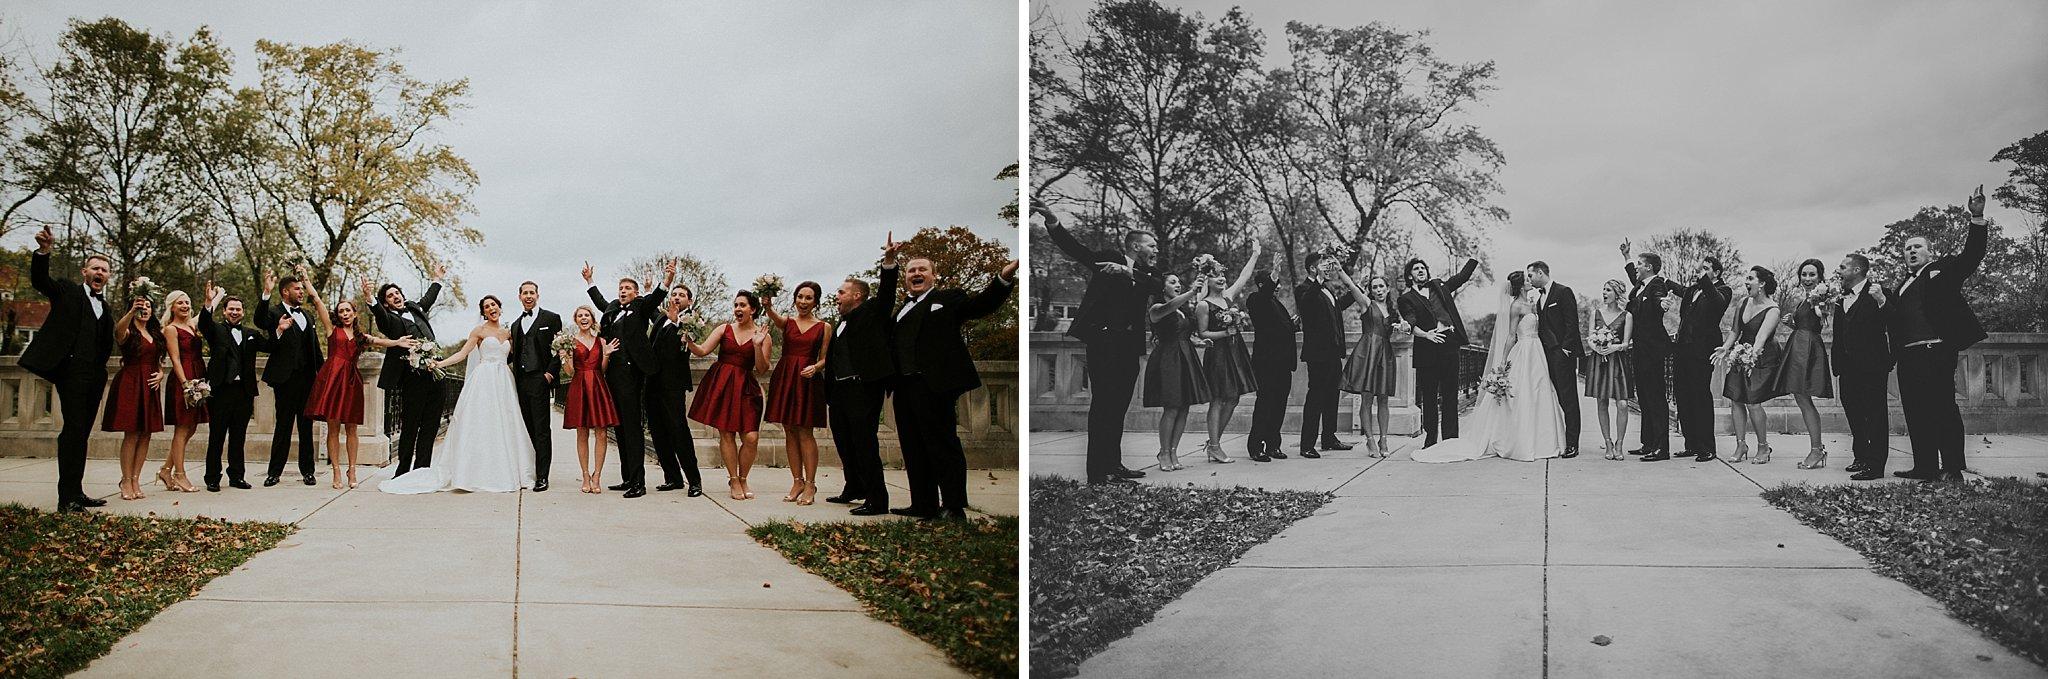 Matt-Lauren_St-Marys_Hilton-City-Center-Milwaukee-Wedding_liller-photo_0037.jpg